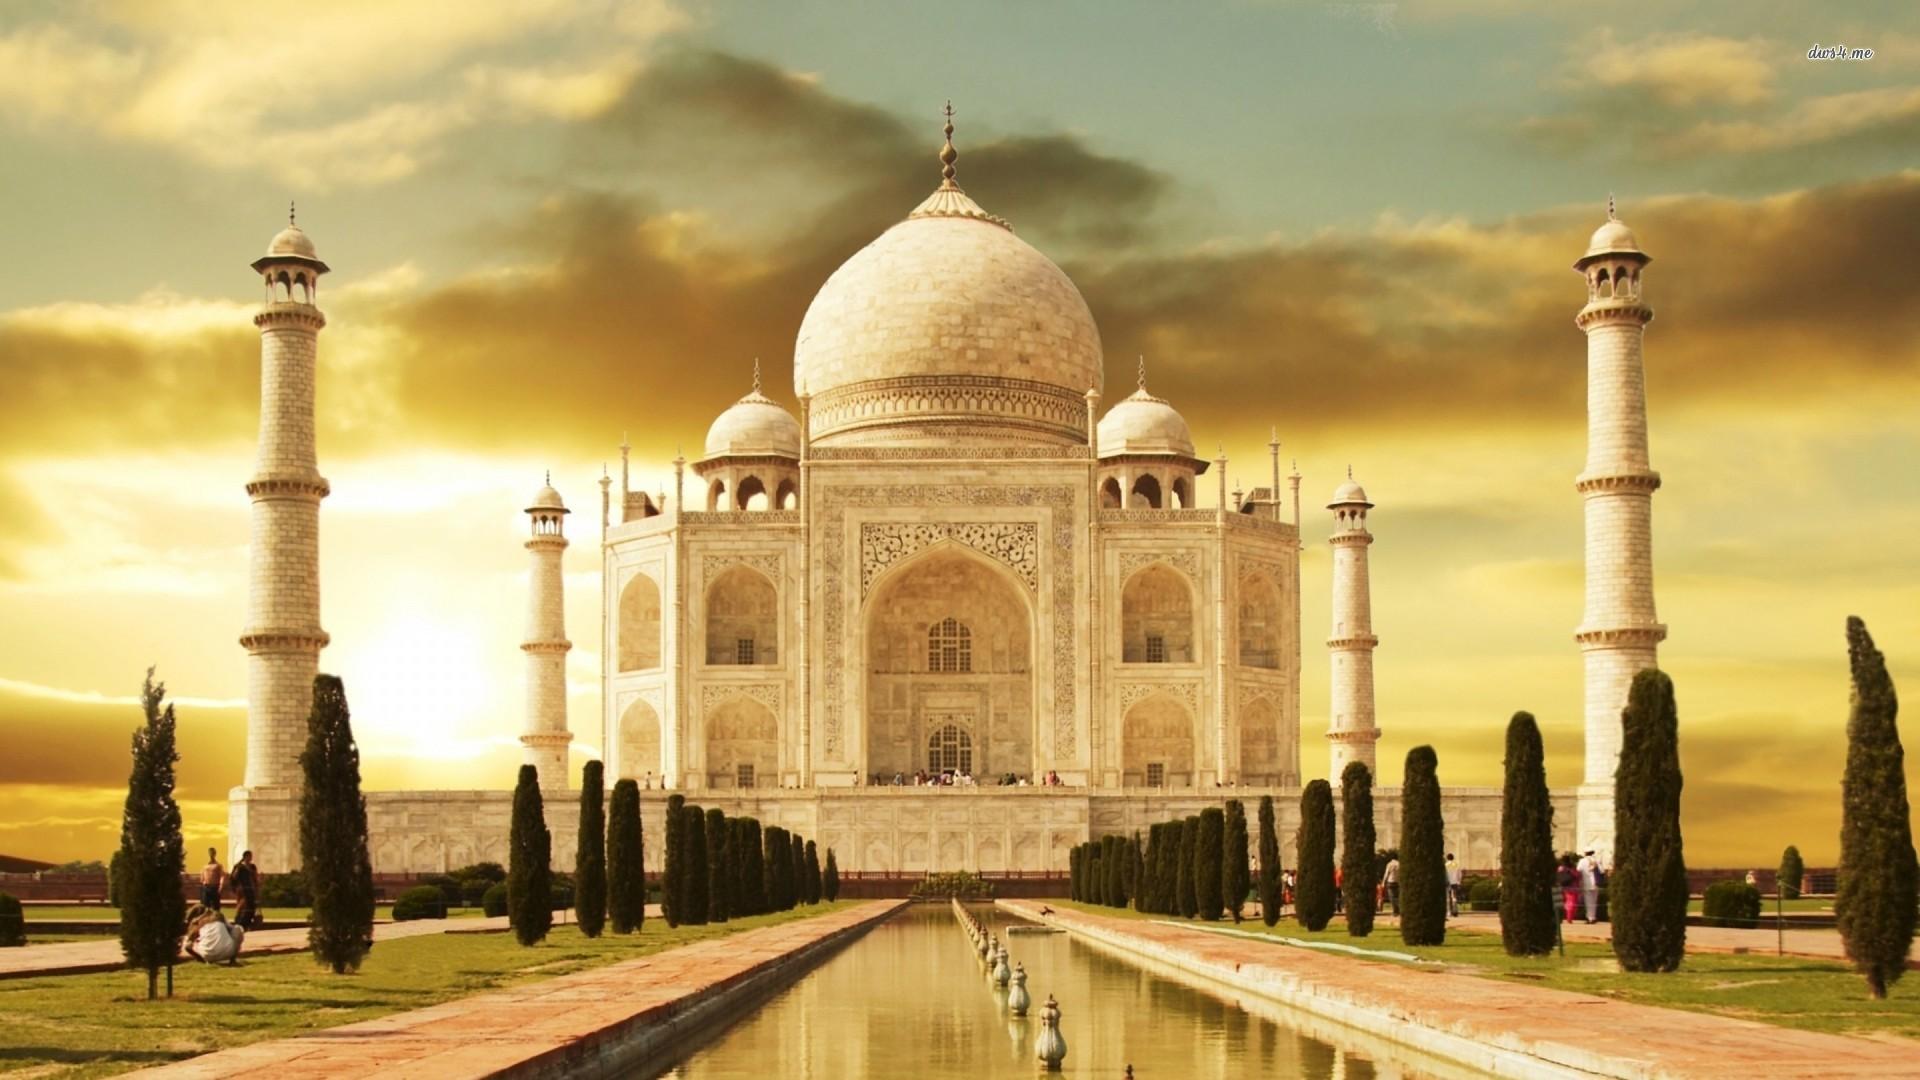 Taj Mahal At Night Wallpaper 3d ①